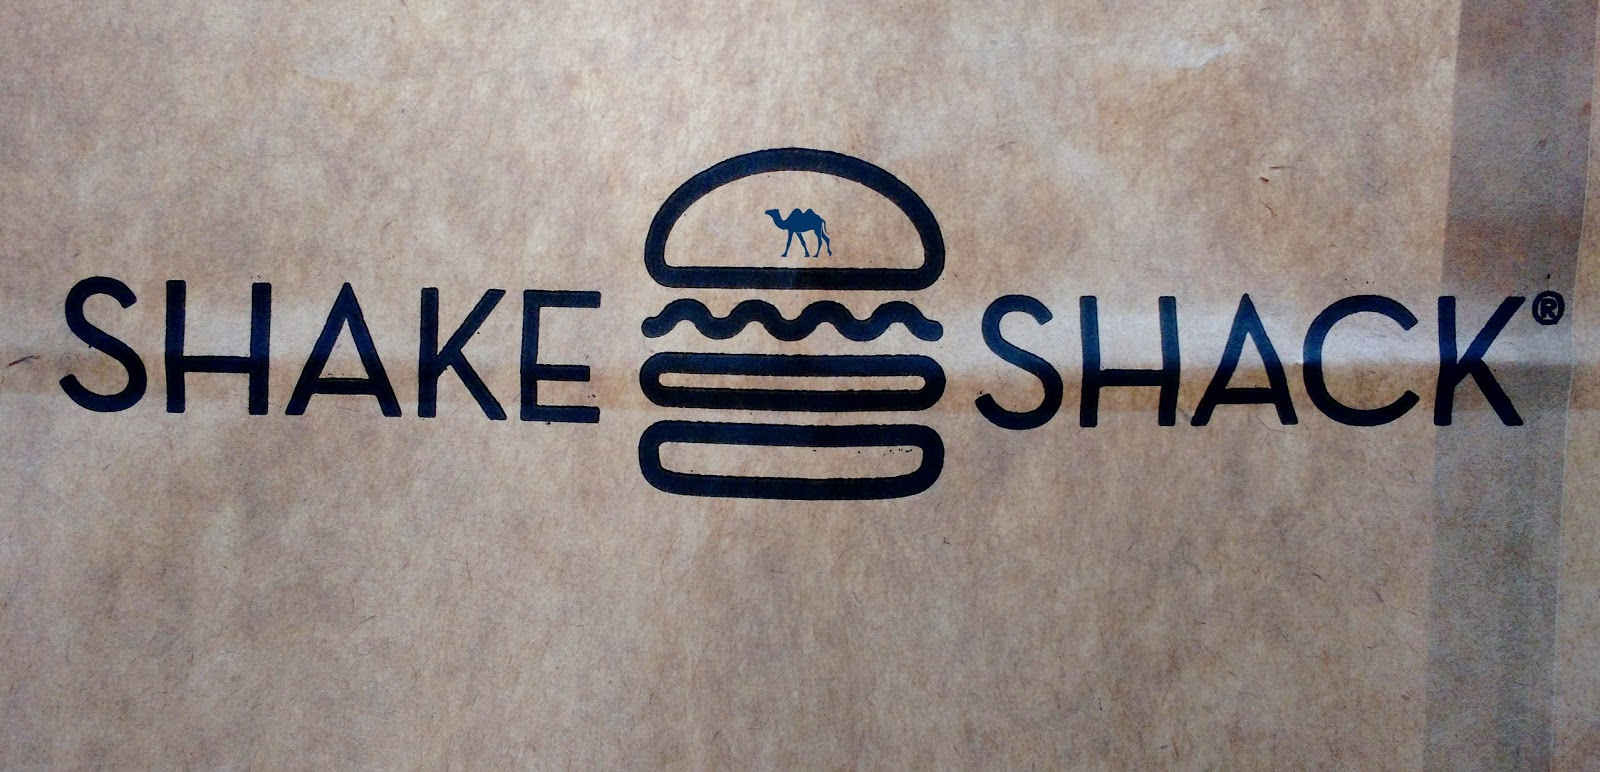 Shake Schack  Burger Fast Food - Le Chameau Bleu